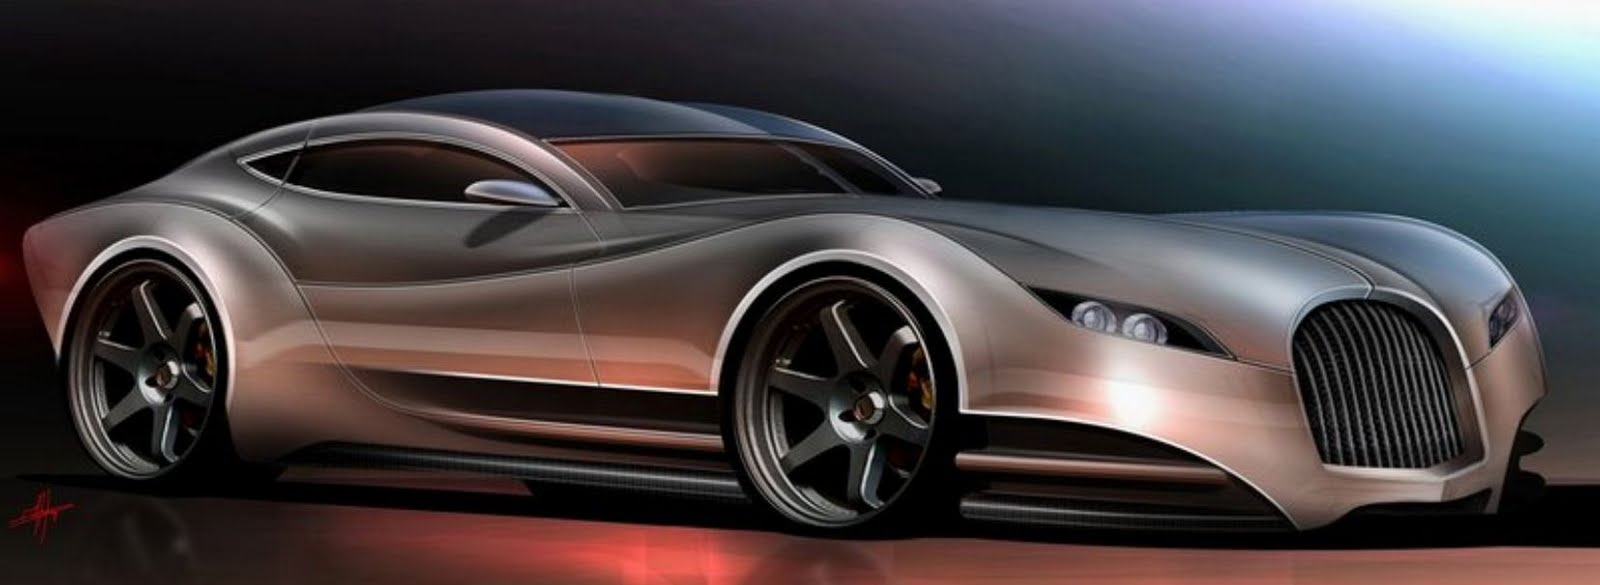 New Sports Cars Morgan Evagt Autos Car